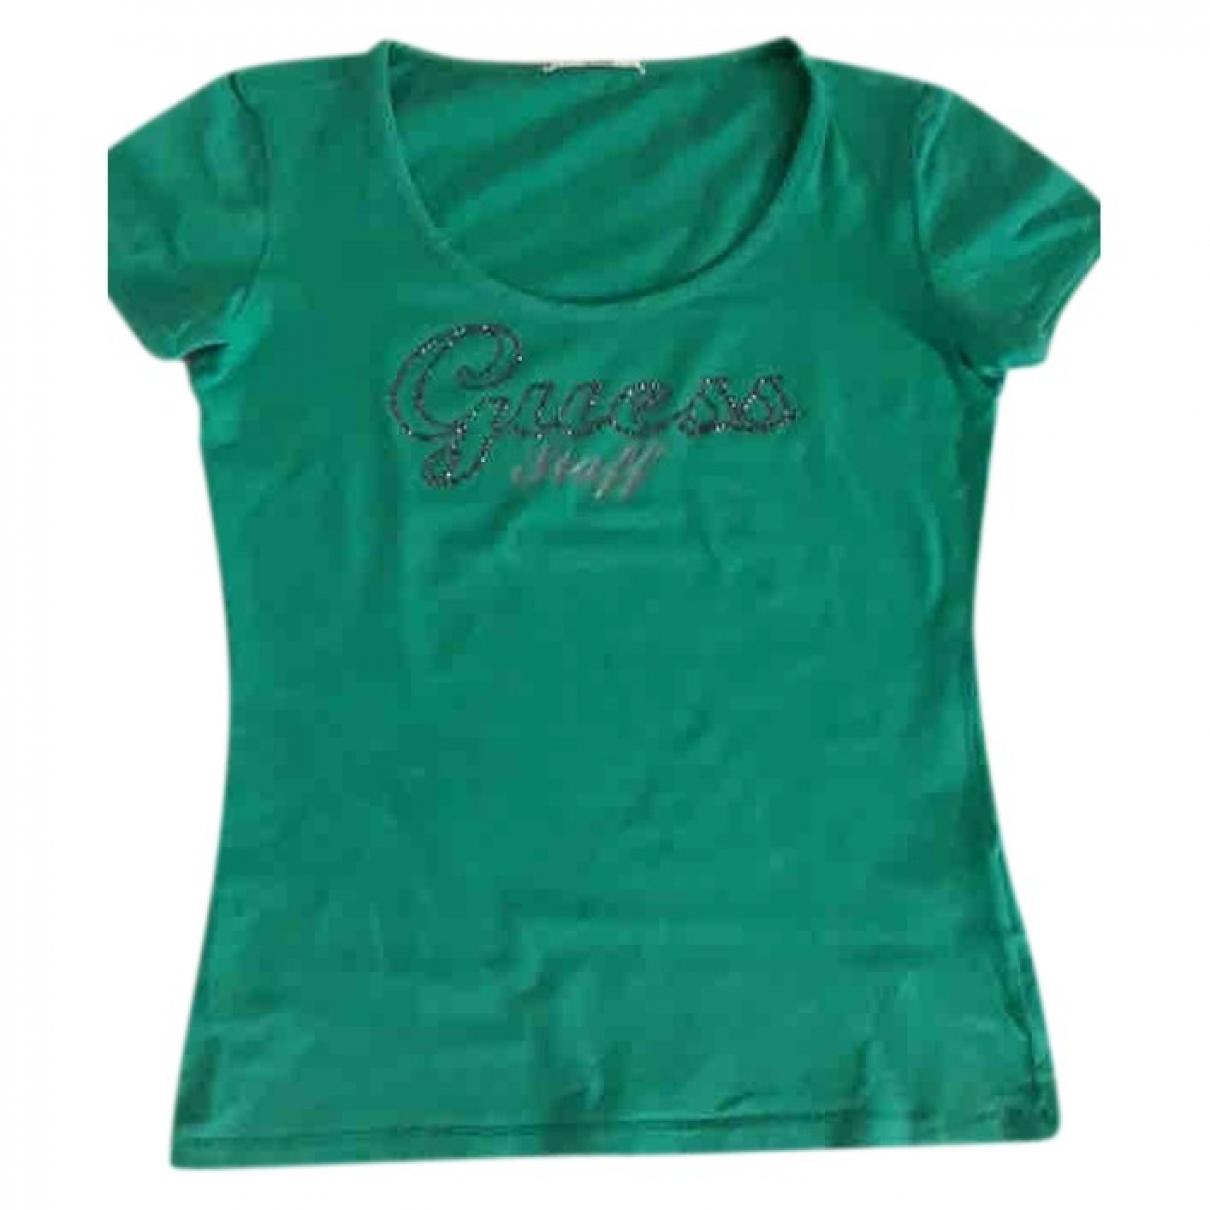 Guess - Top   pour femme - vert